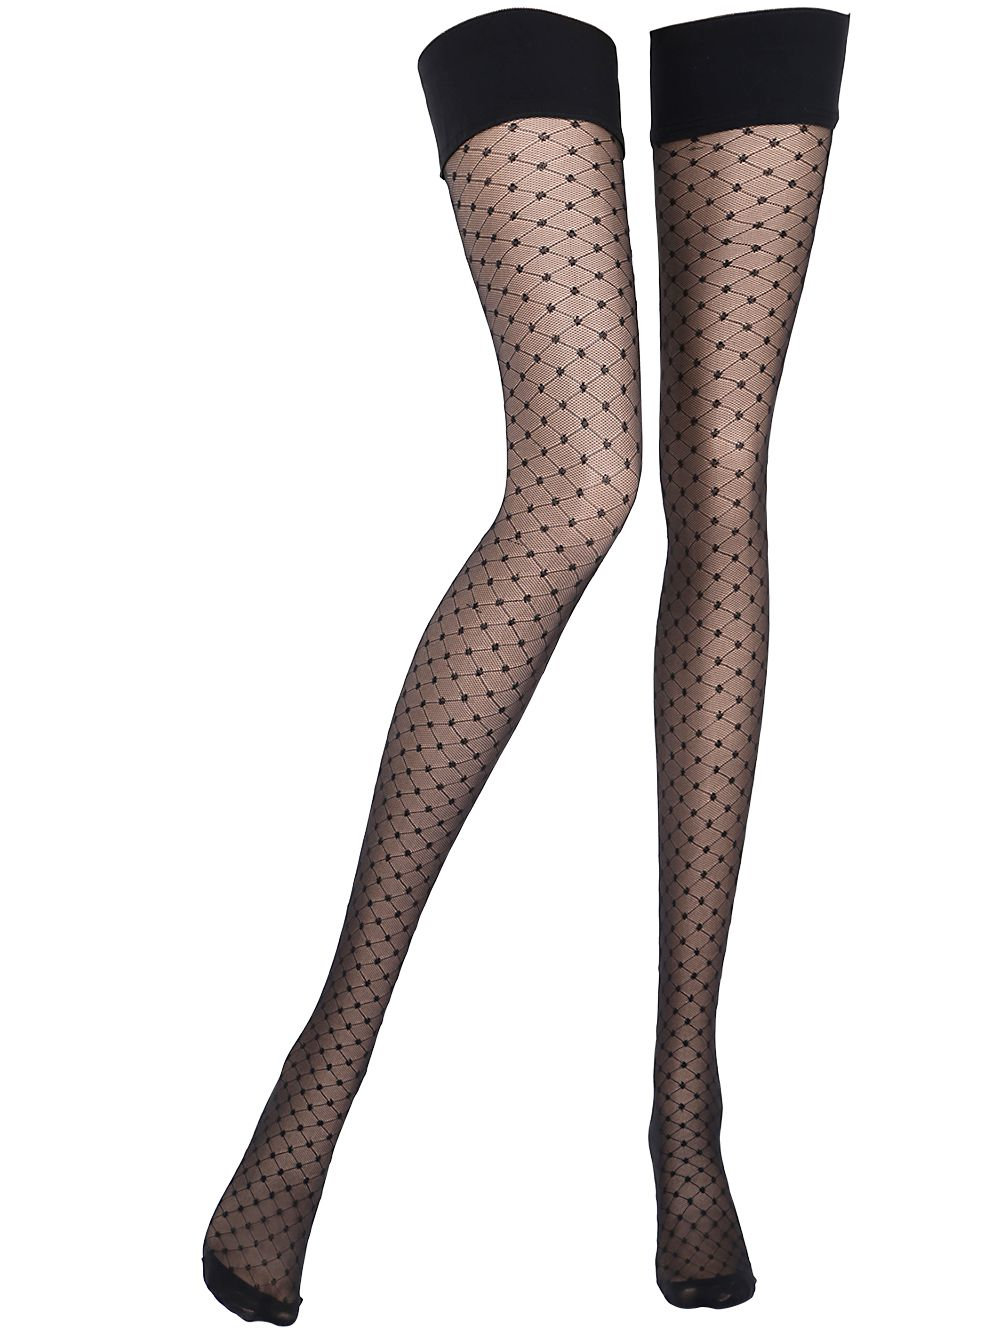 f2d00c615 Chantal Thomass Bandana Polka Dot Thigh High Stockings in Black - Lyst